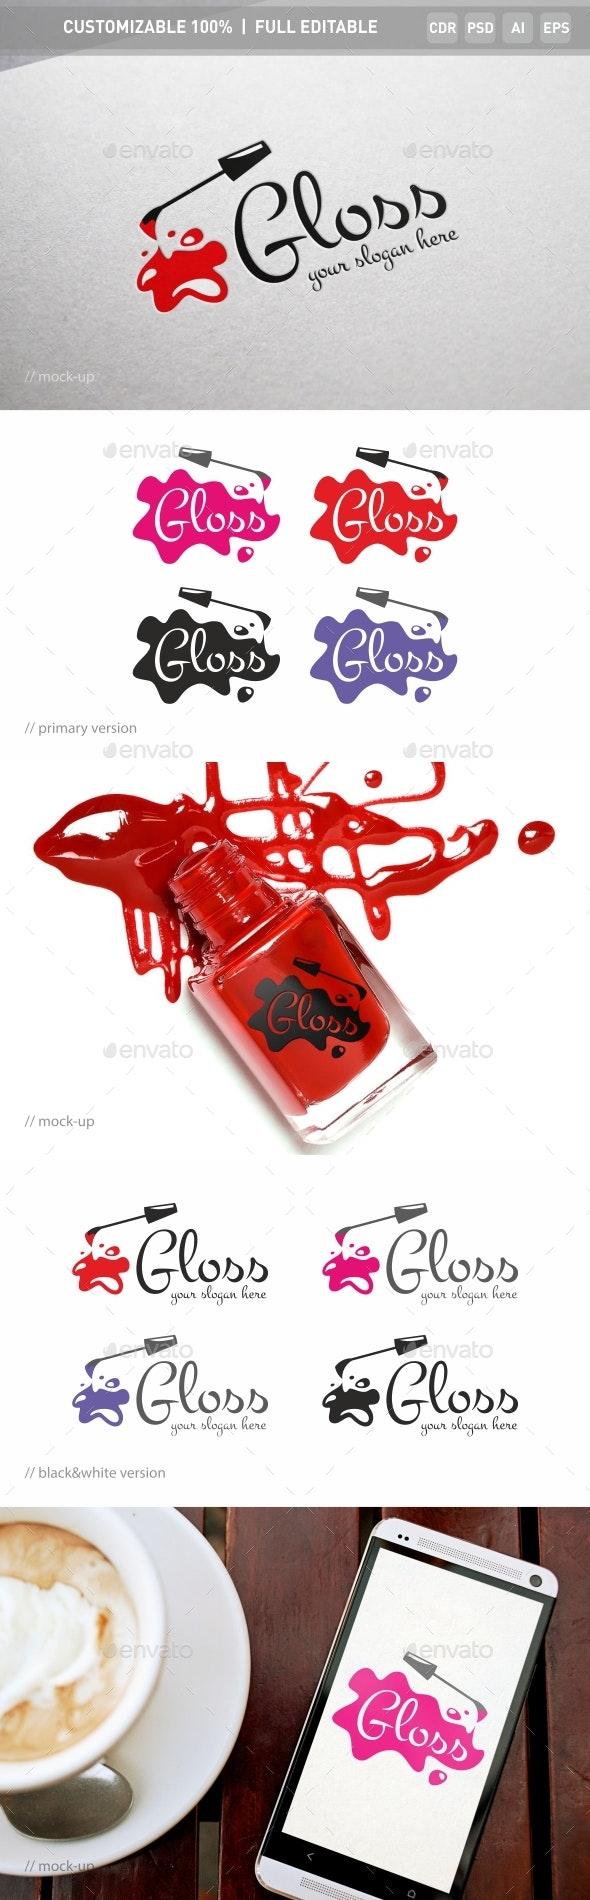 Gloss Nail Logo Template - Objects Logo Templates